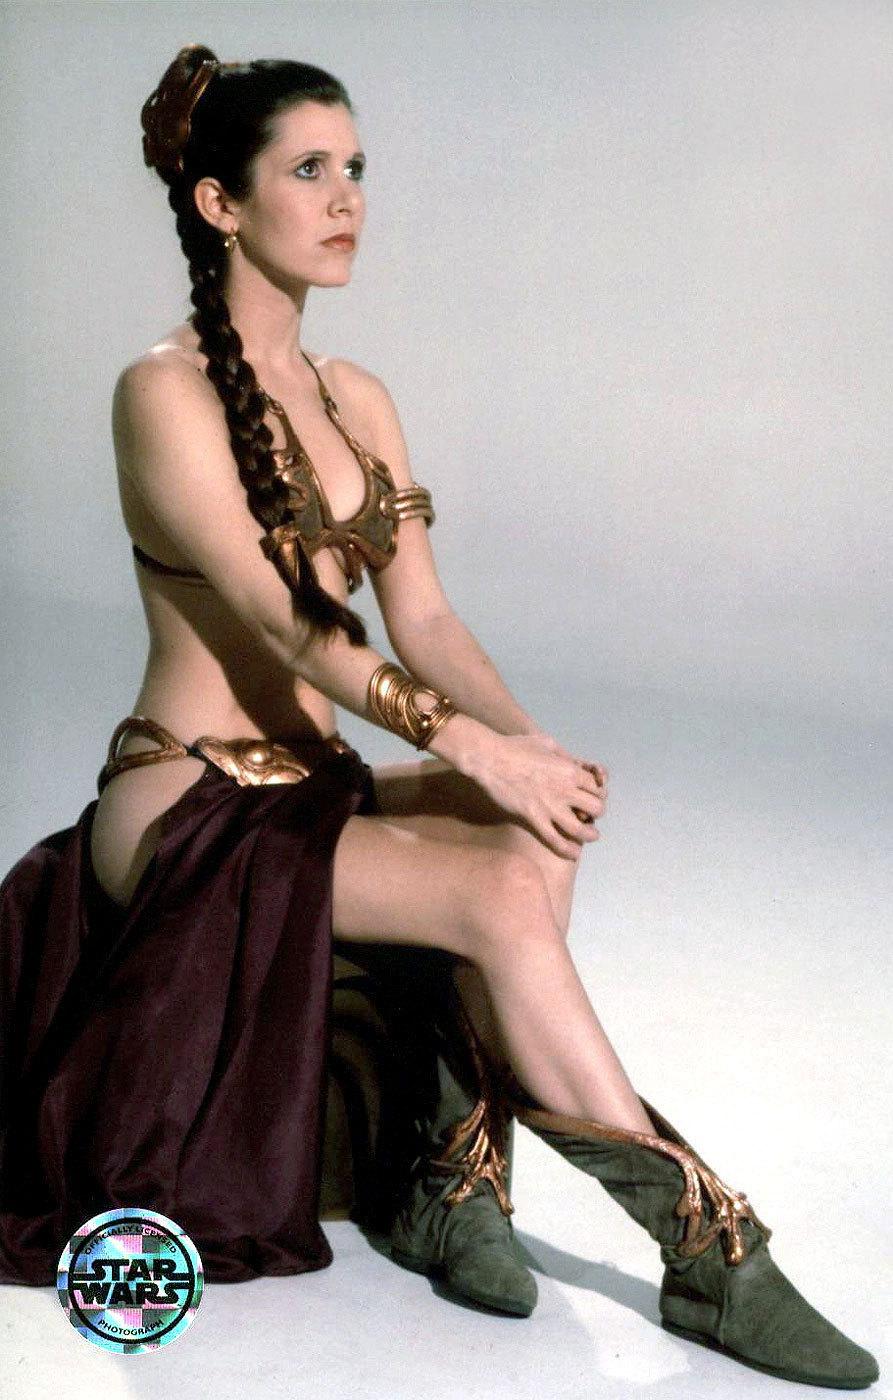 Slave Leia bikini and braids.